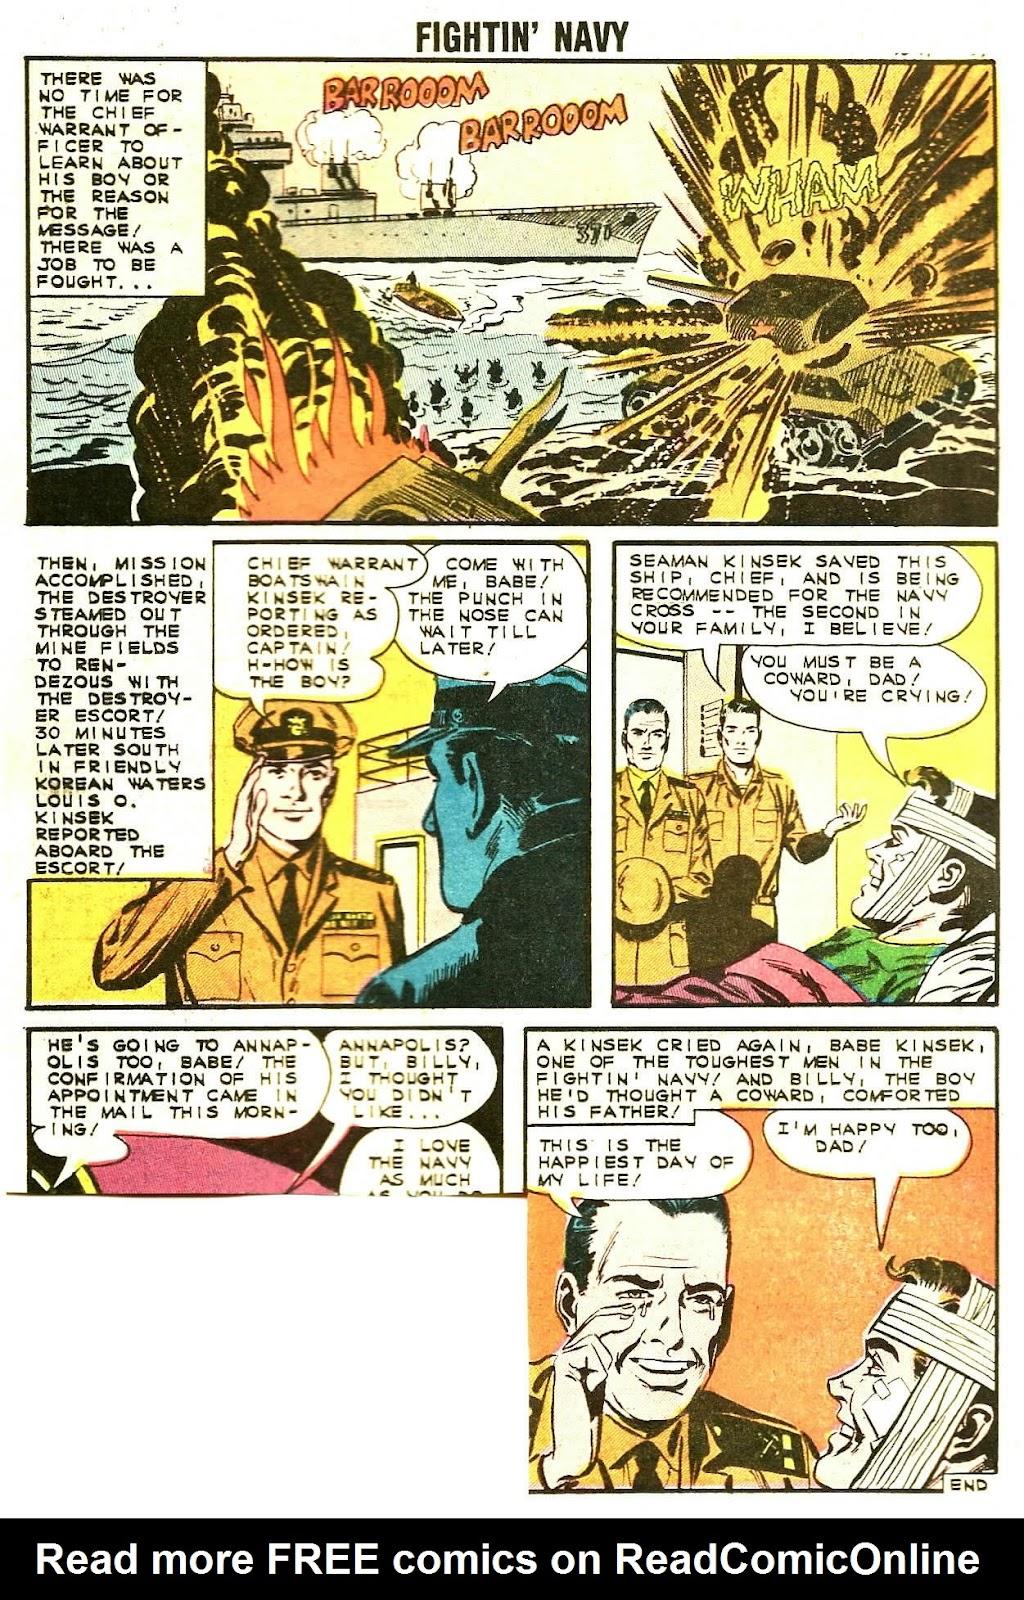 Read online Fightin' Navy comic -  Issue #107 - 16